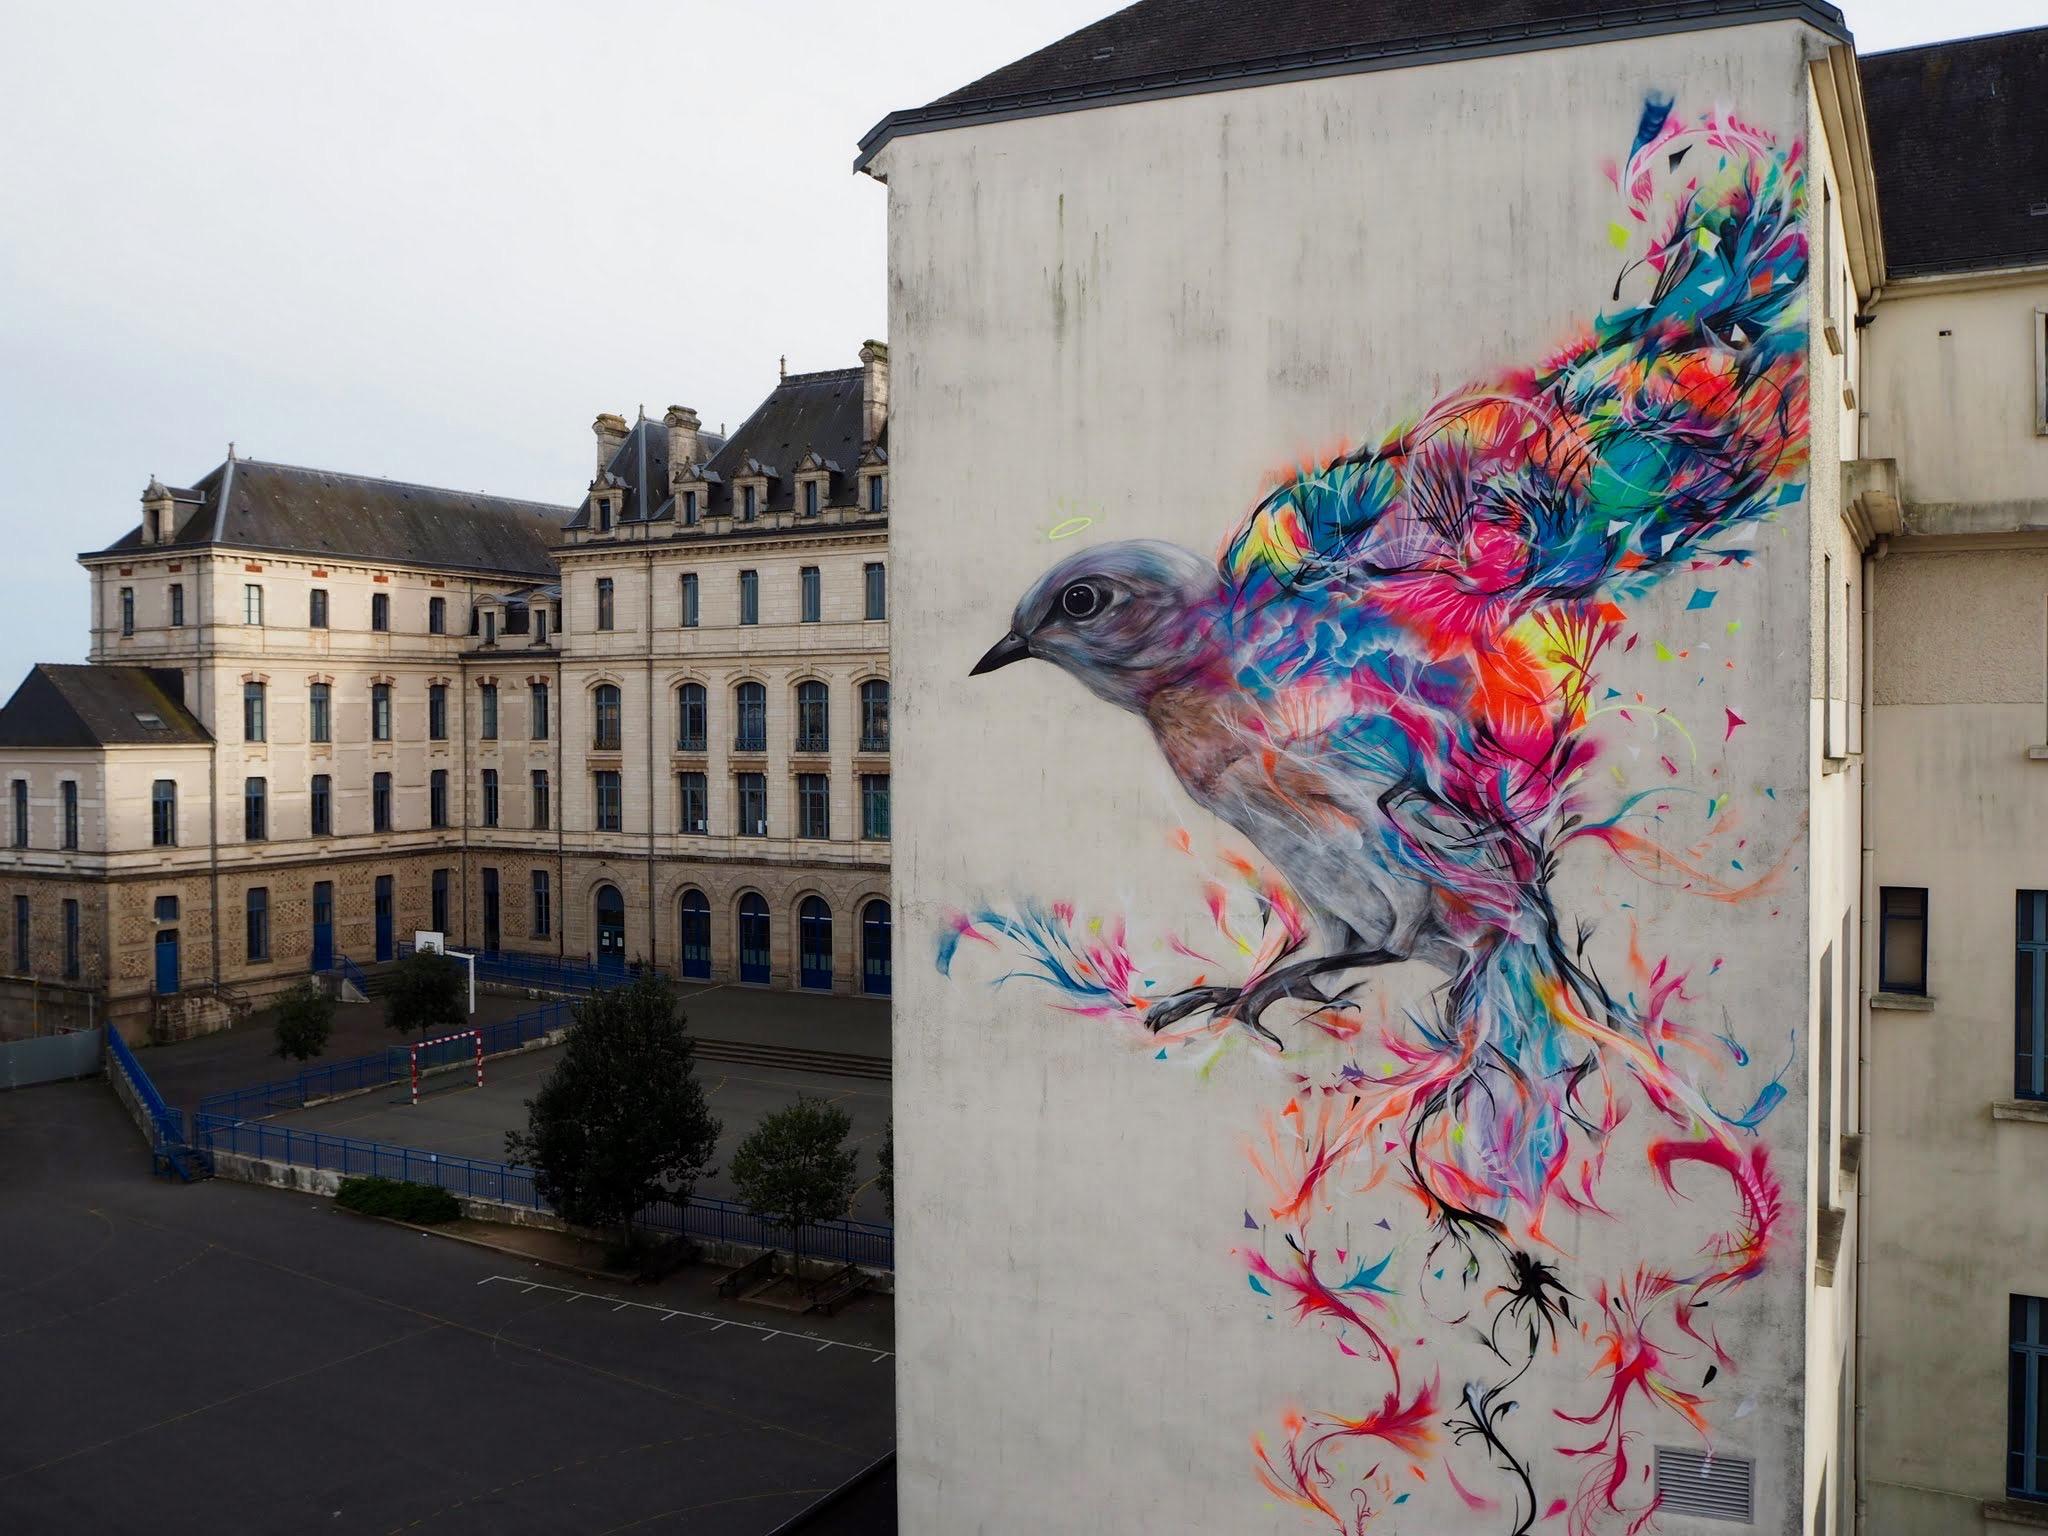 Le célèbre L7M In Vannes, France | StreetArtNews | StreetArtNews @BY_69